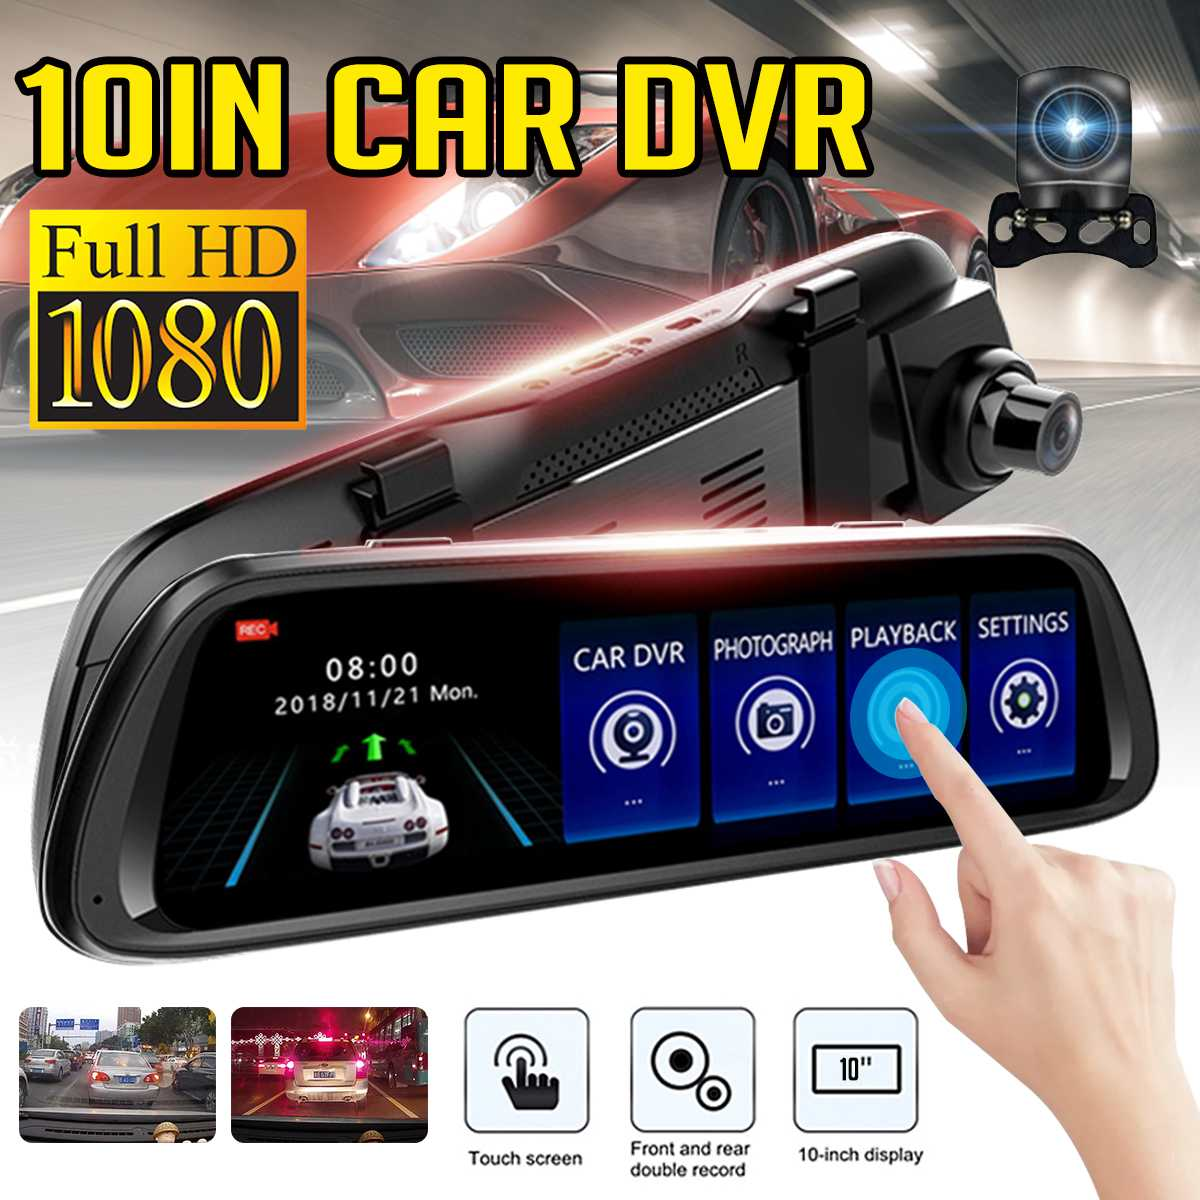 Car DVR Camera 10Android Stream Media Rear View Mirror FHD 1080P WiFi GPS Dash Cam Registrar Video RecorderCar DVR Camera 10Android Stream Media Rear View Mirror FHD 1080P WiFi GPS Dash Cam Registrar Video Recorder